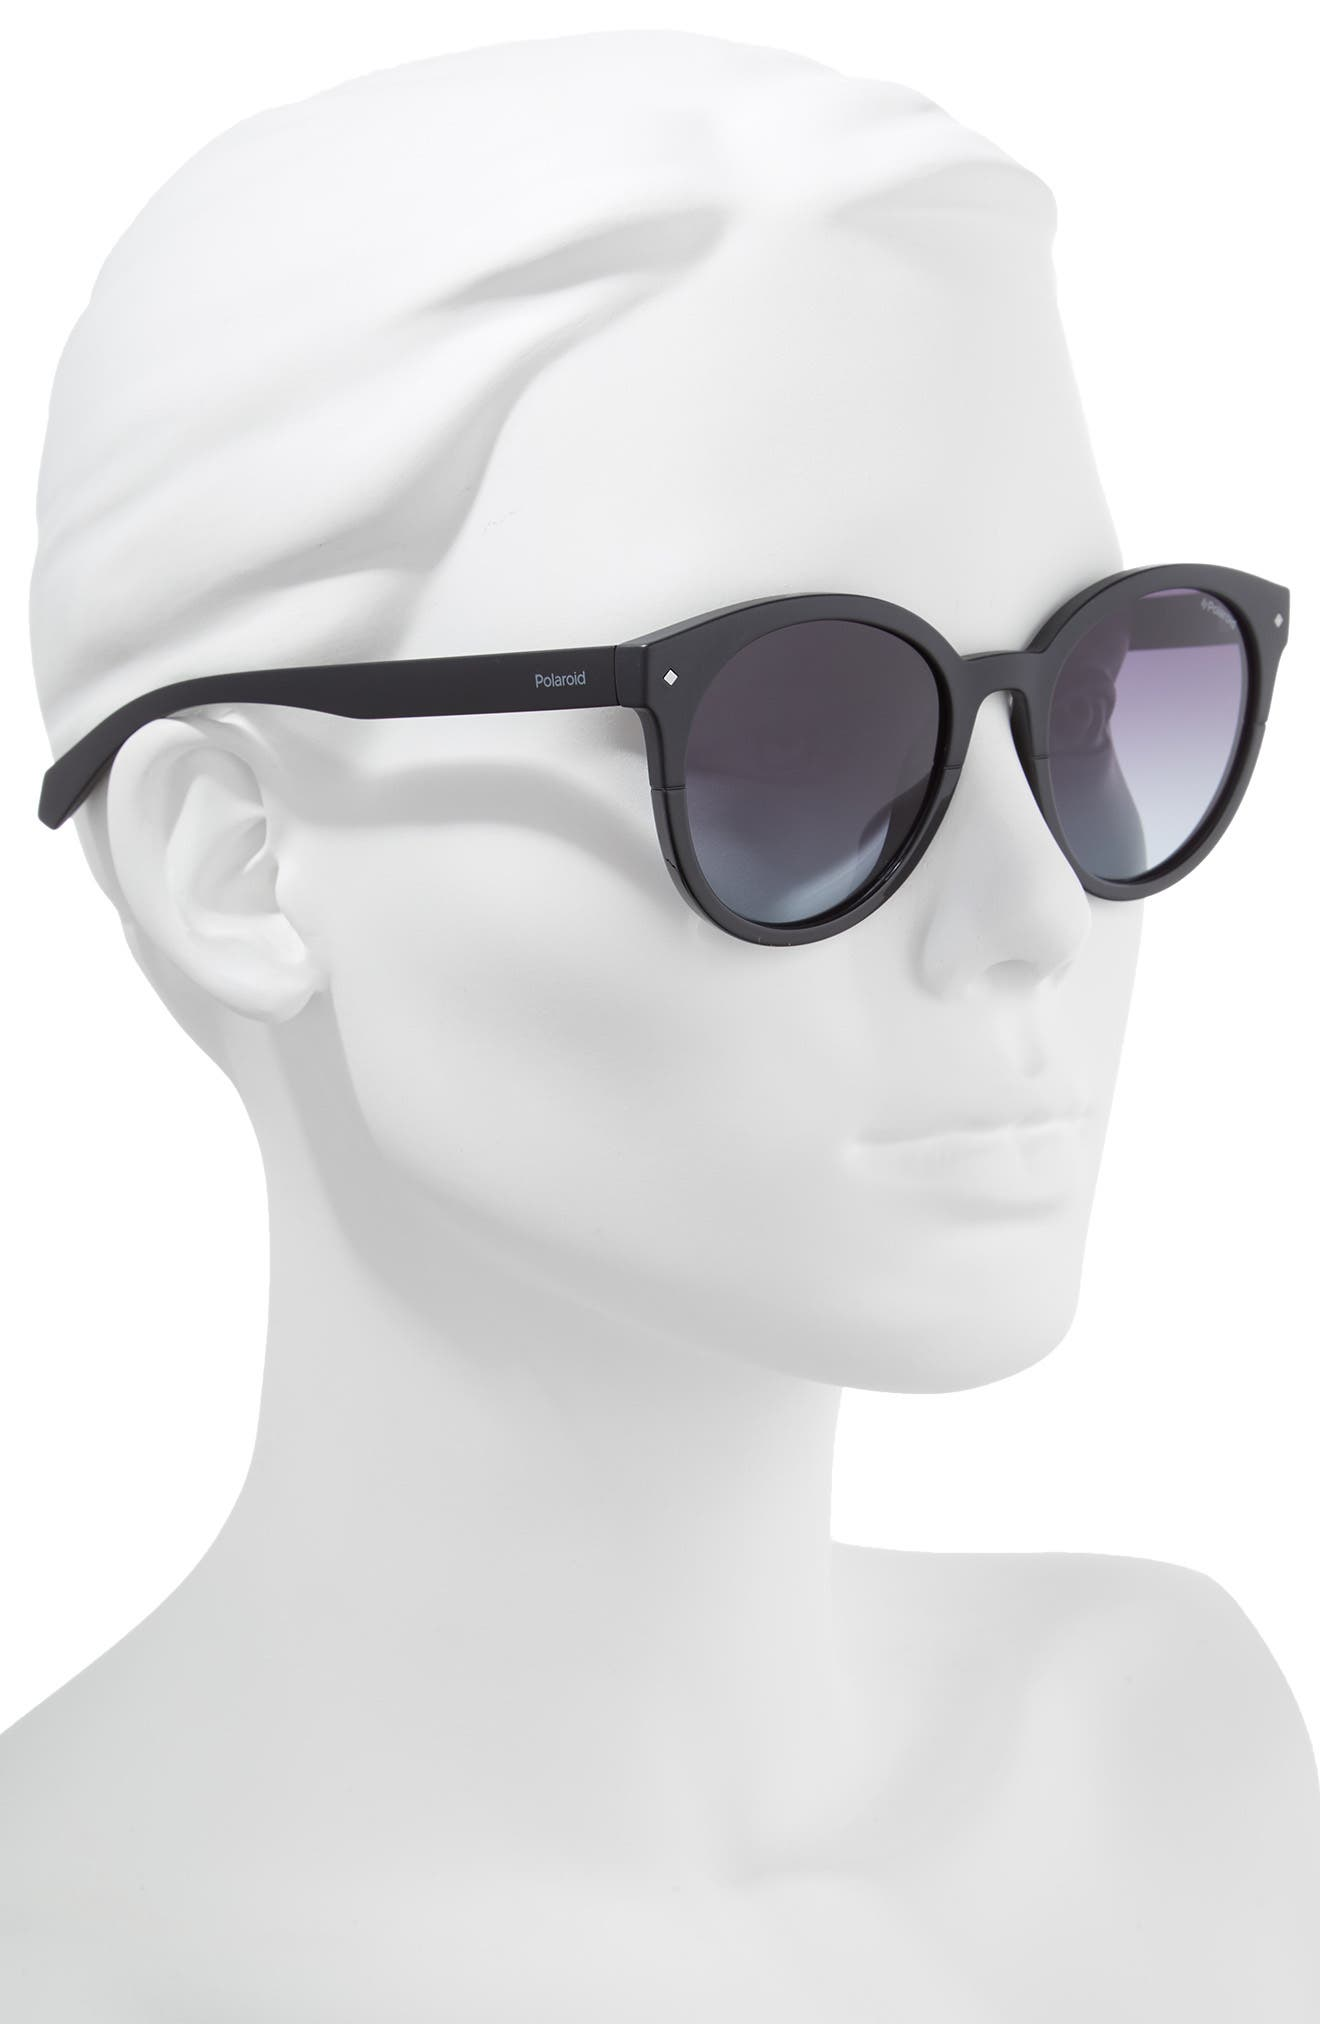 Basic 51mm Polarized Sunglasses,                             Alternate thumbnail 2, color,                             001